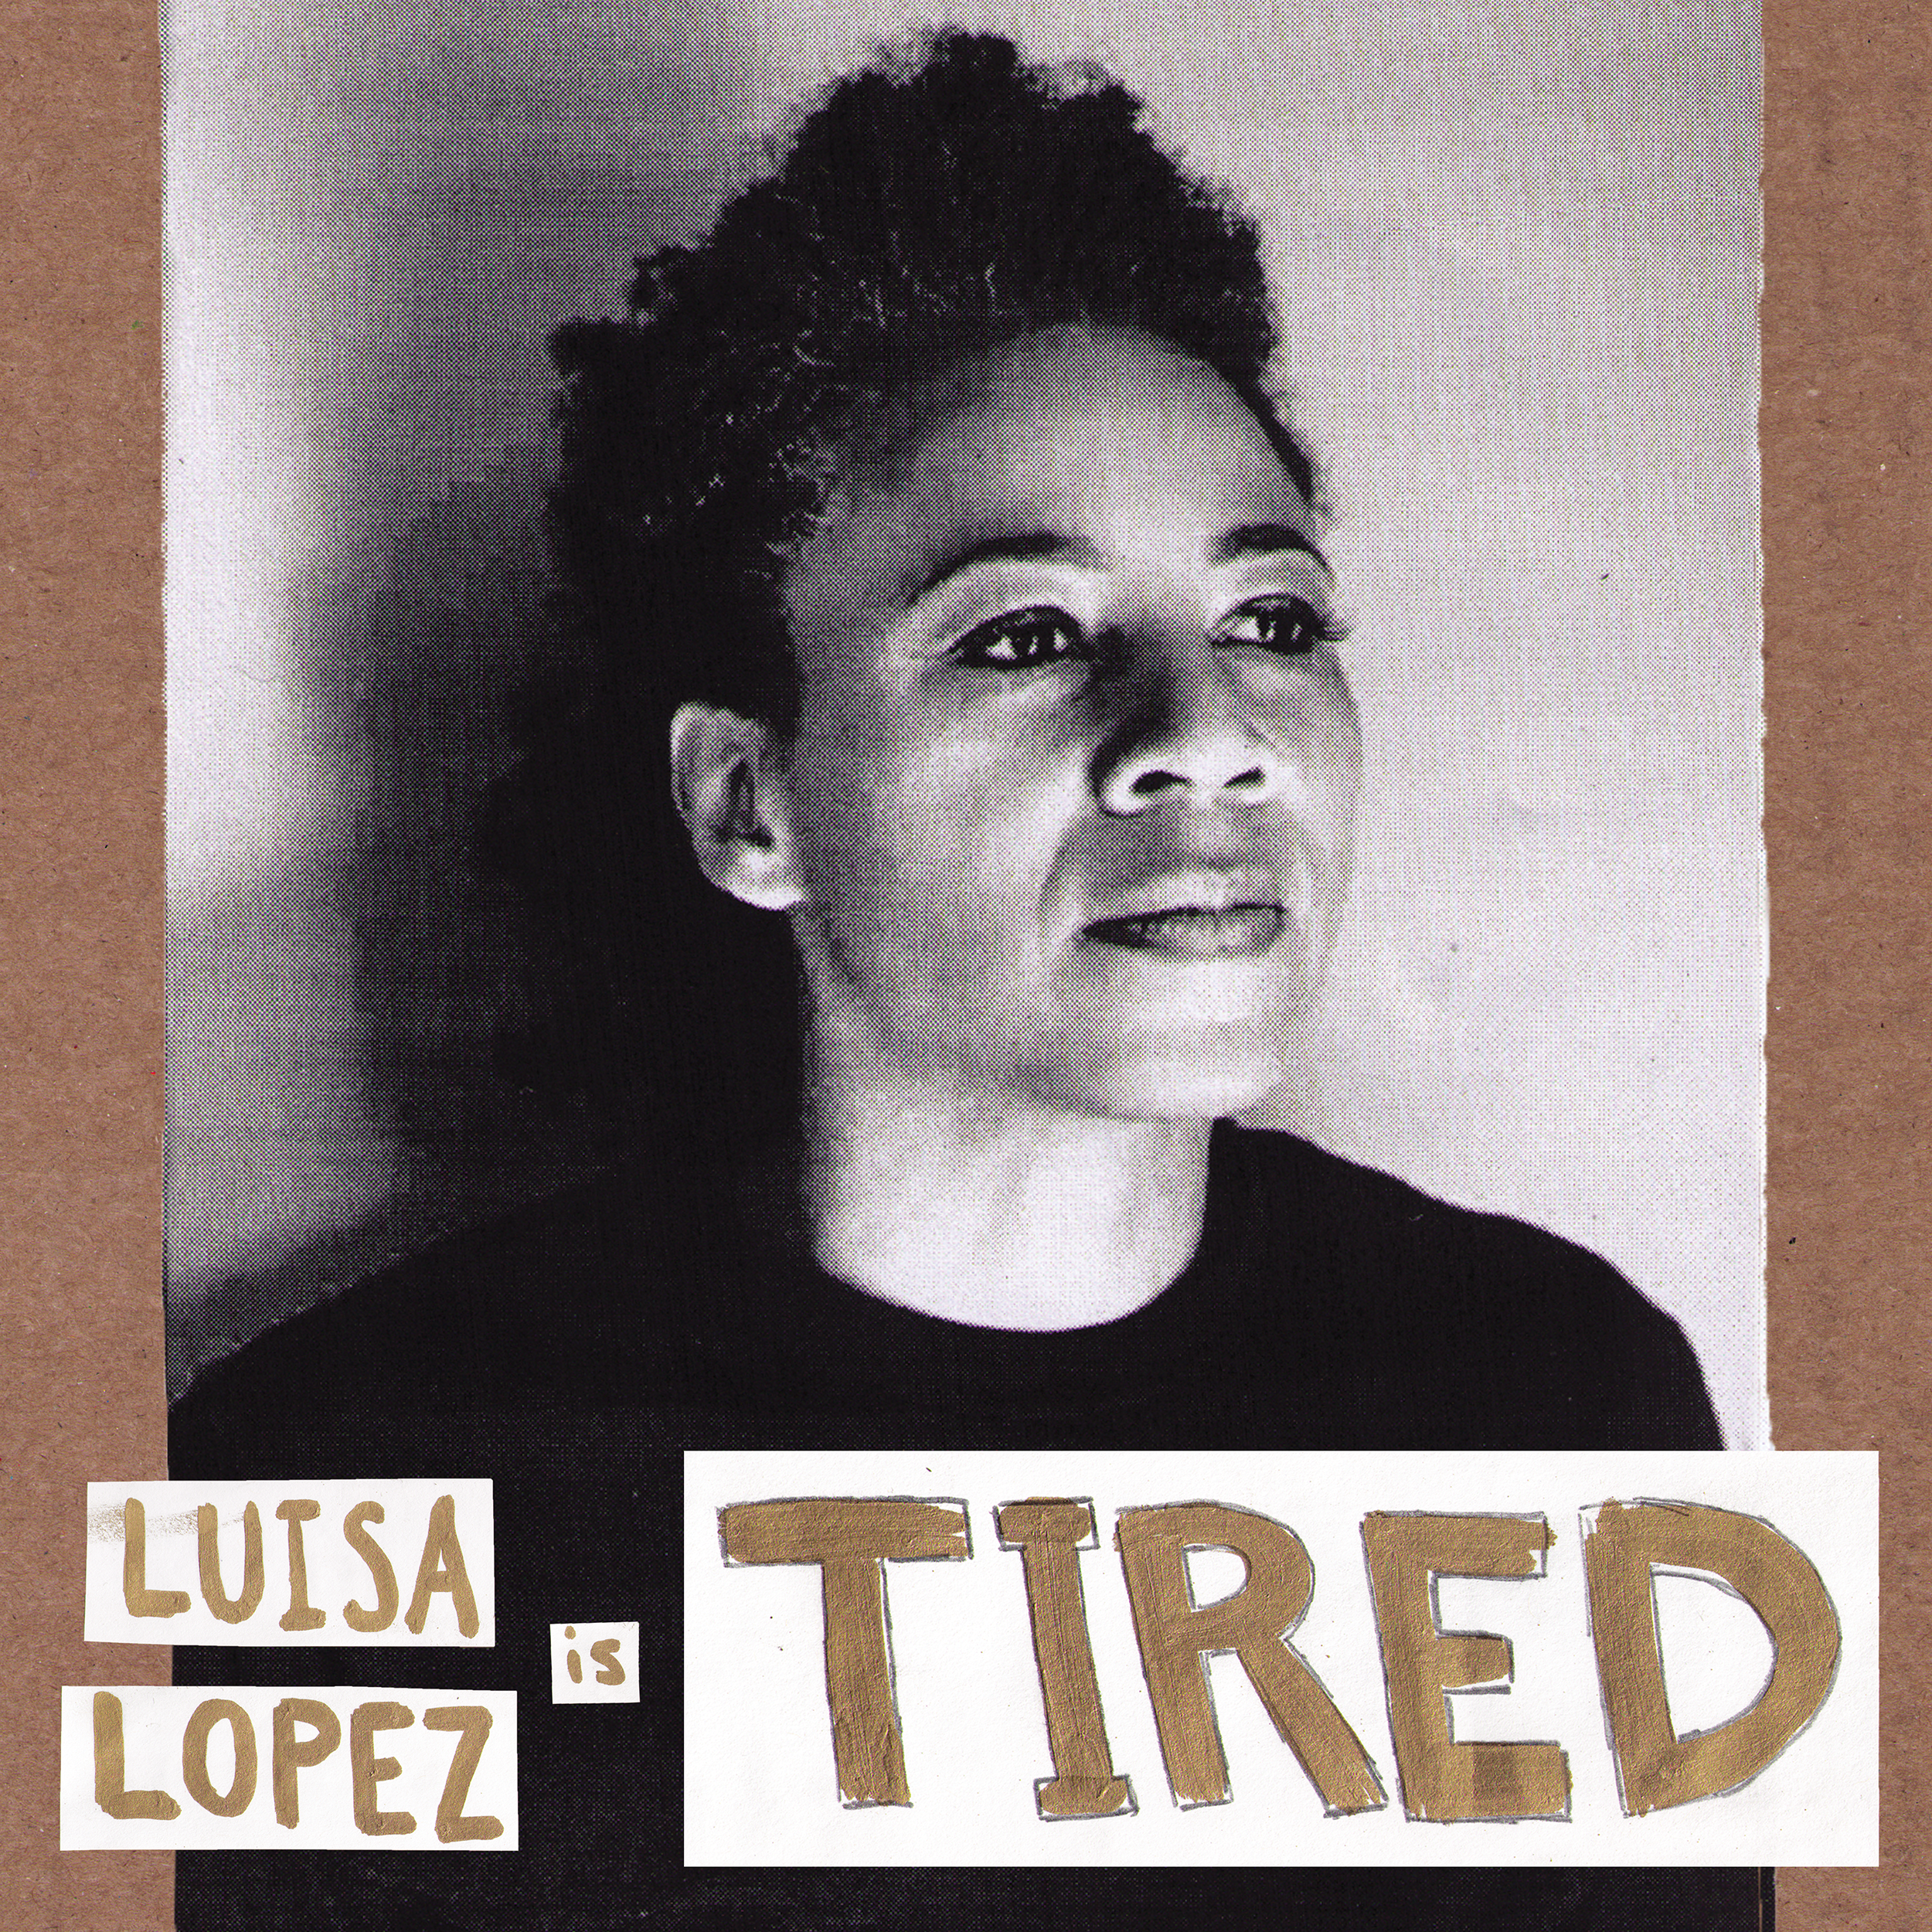 Luisa-Lopez-Tired-Single-2500.png